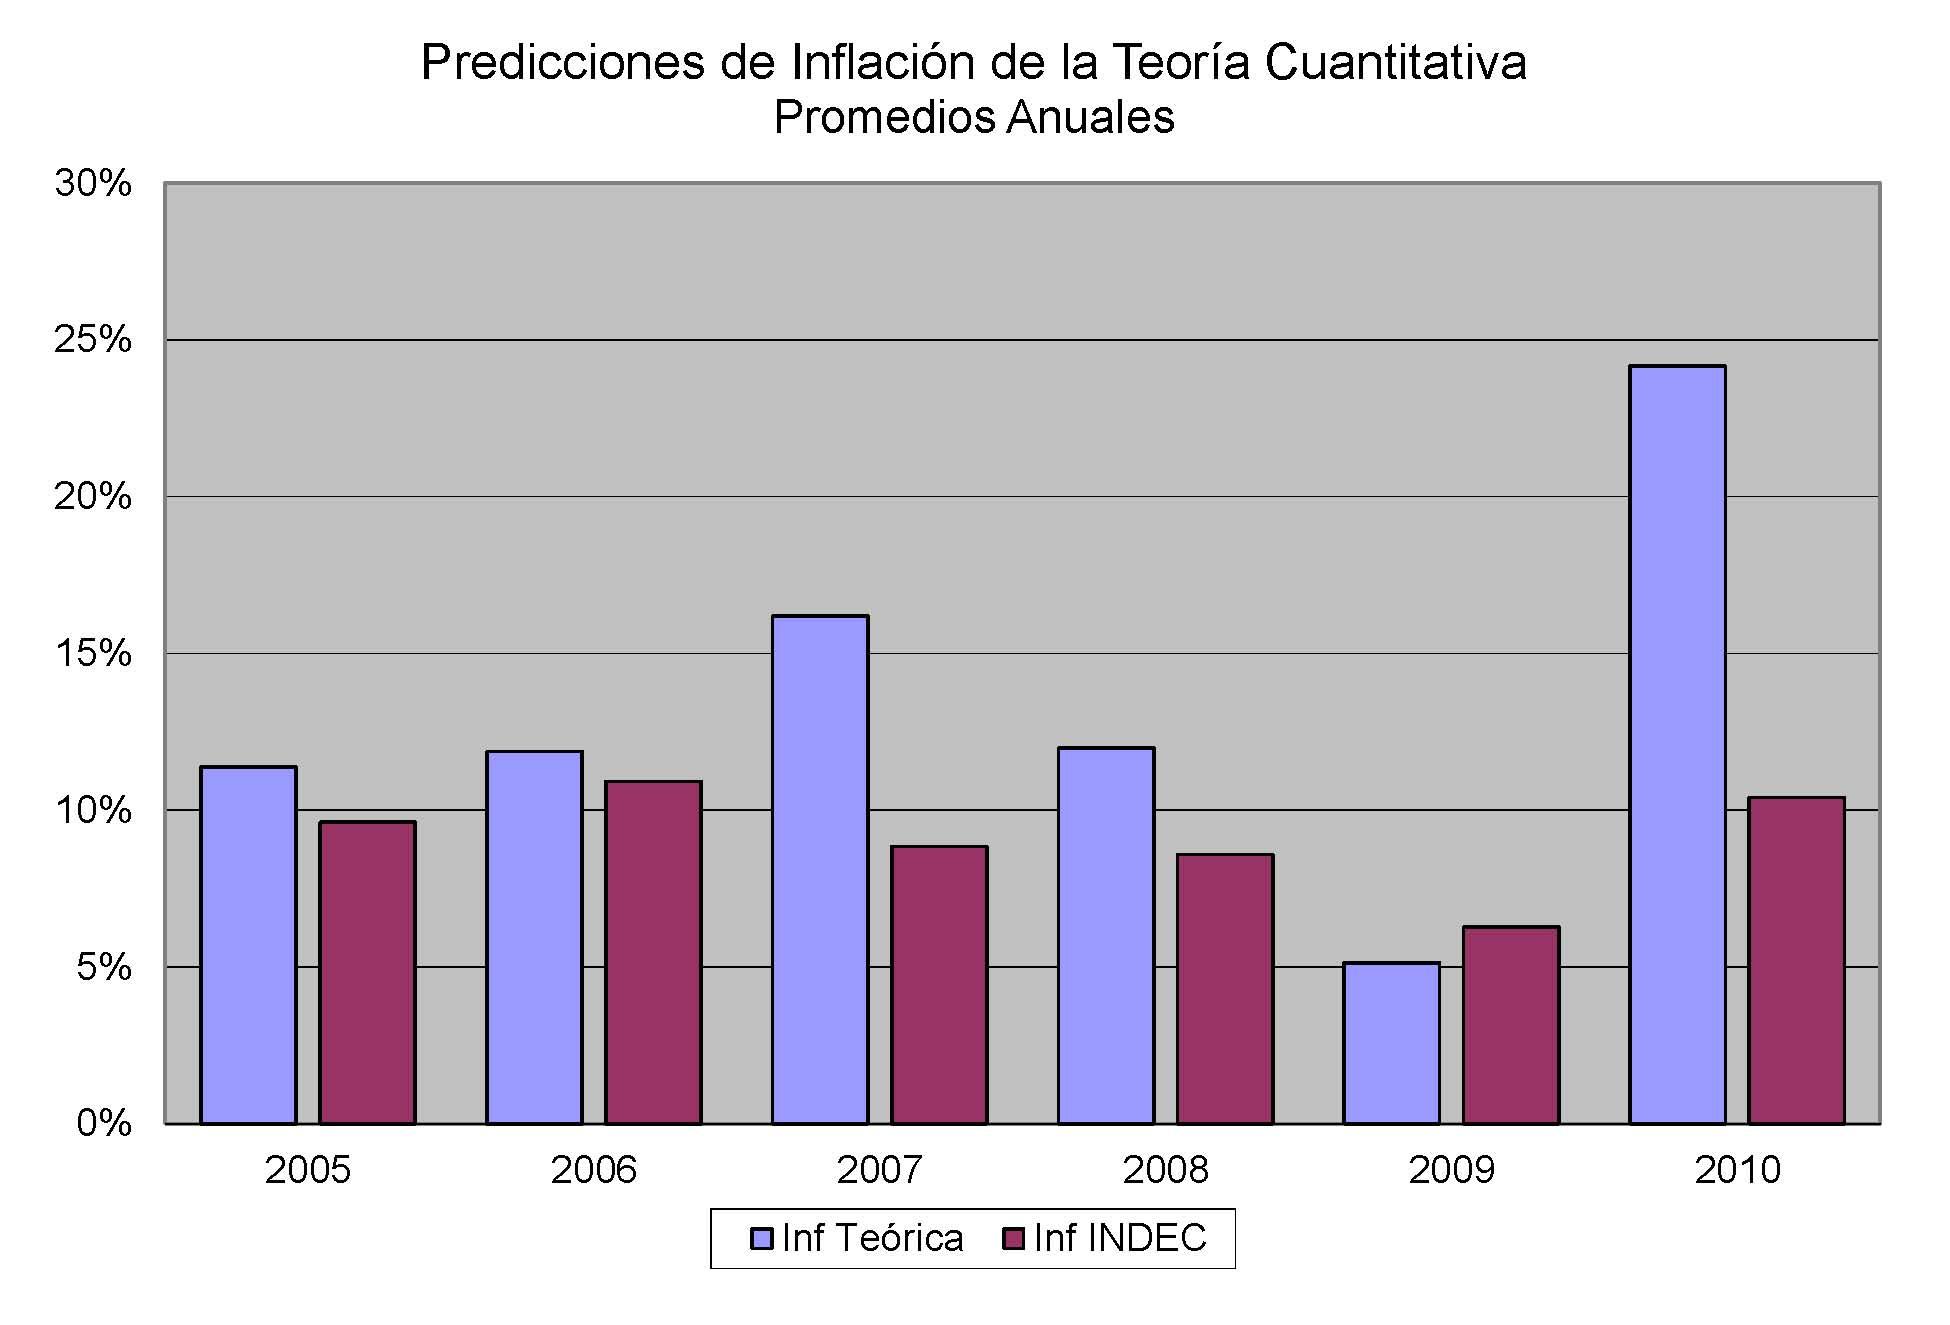 inflacion promedio anual: